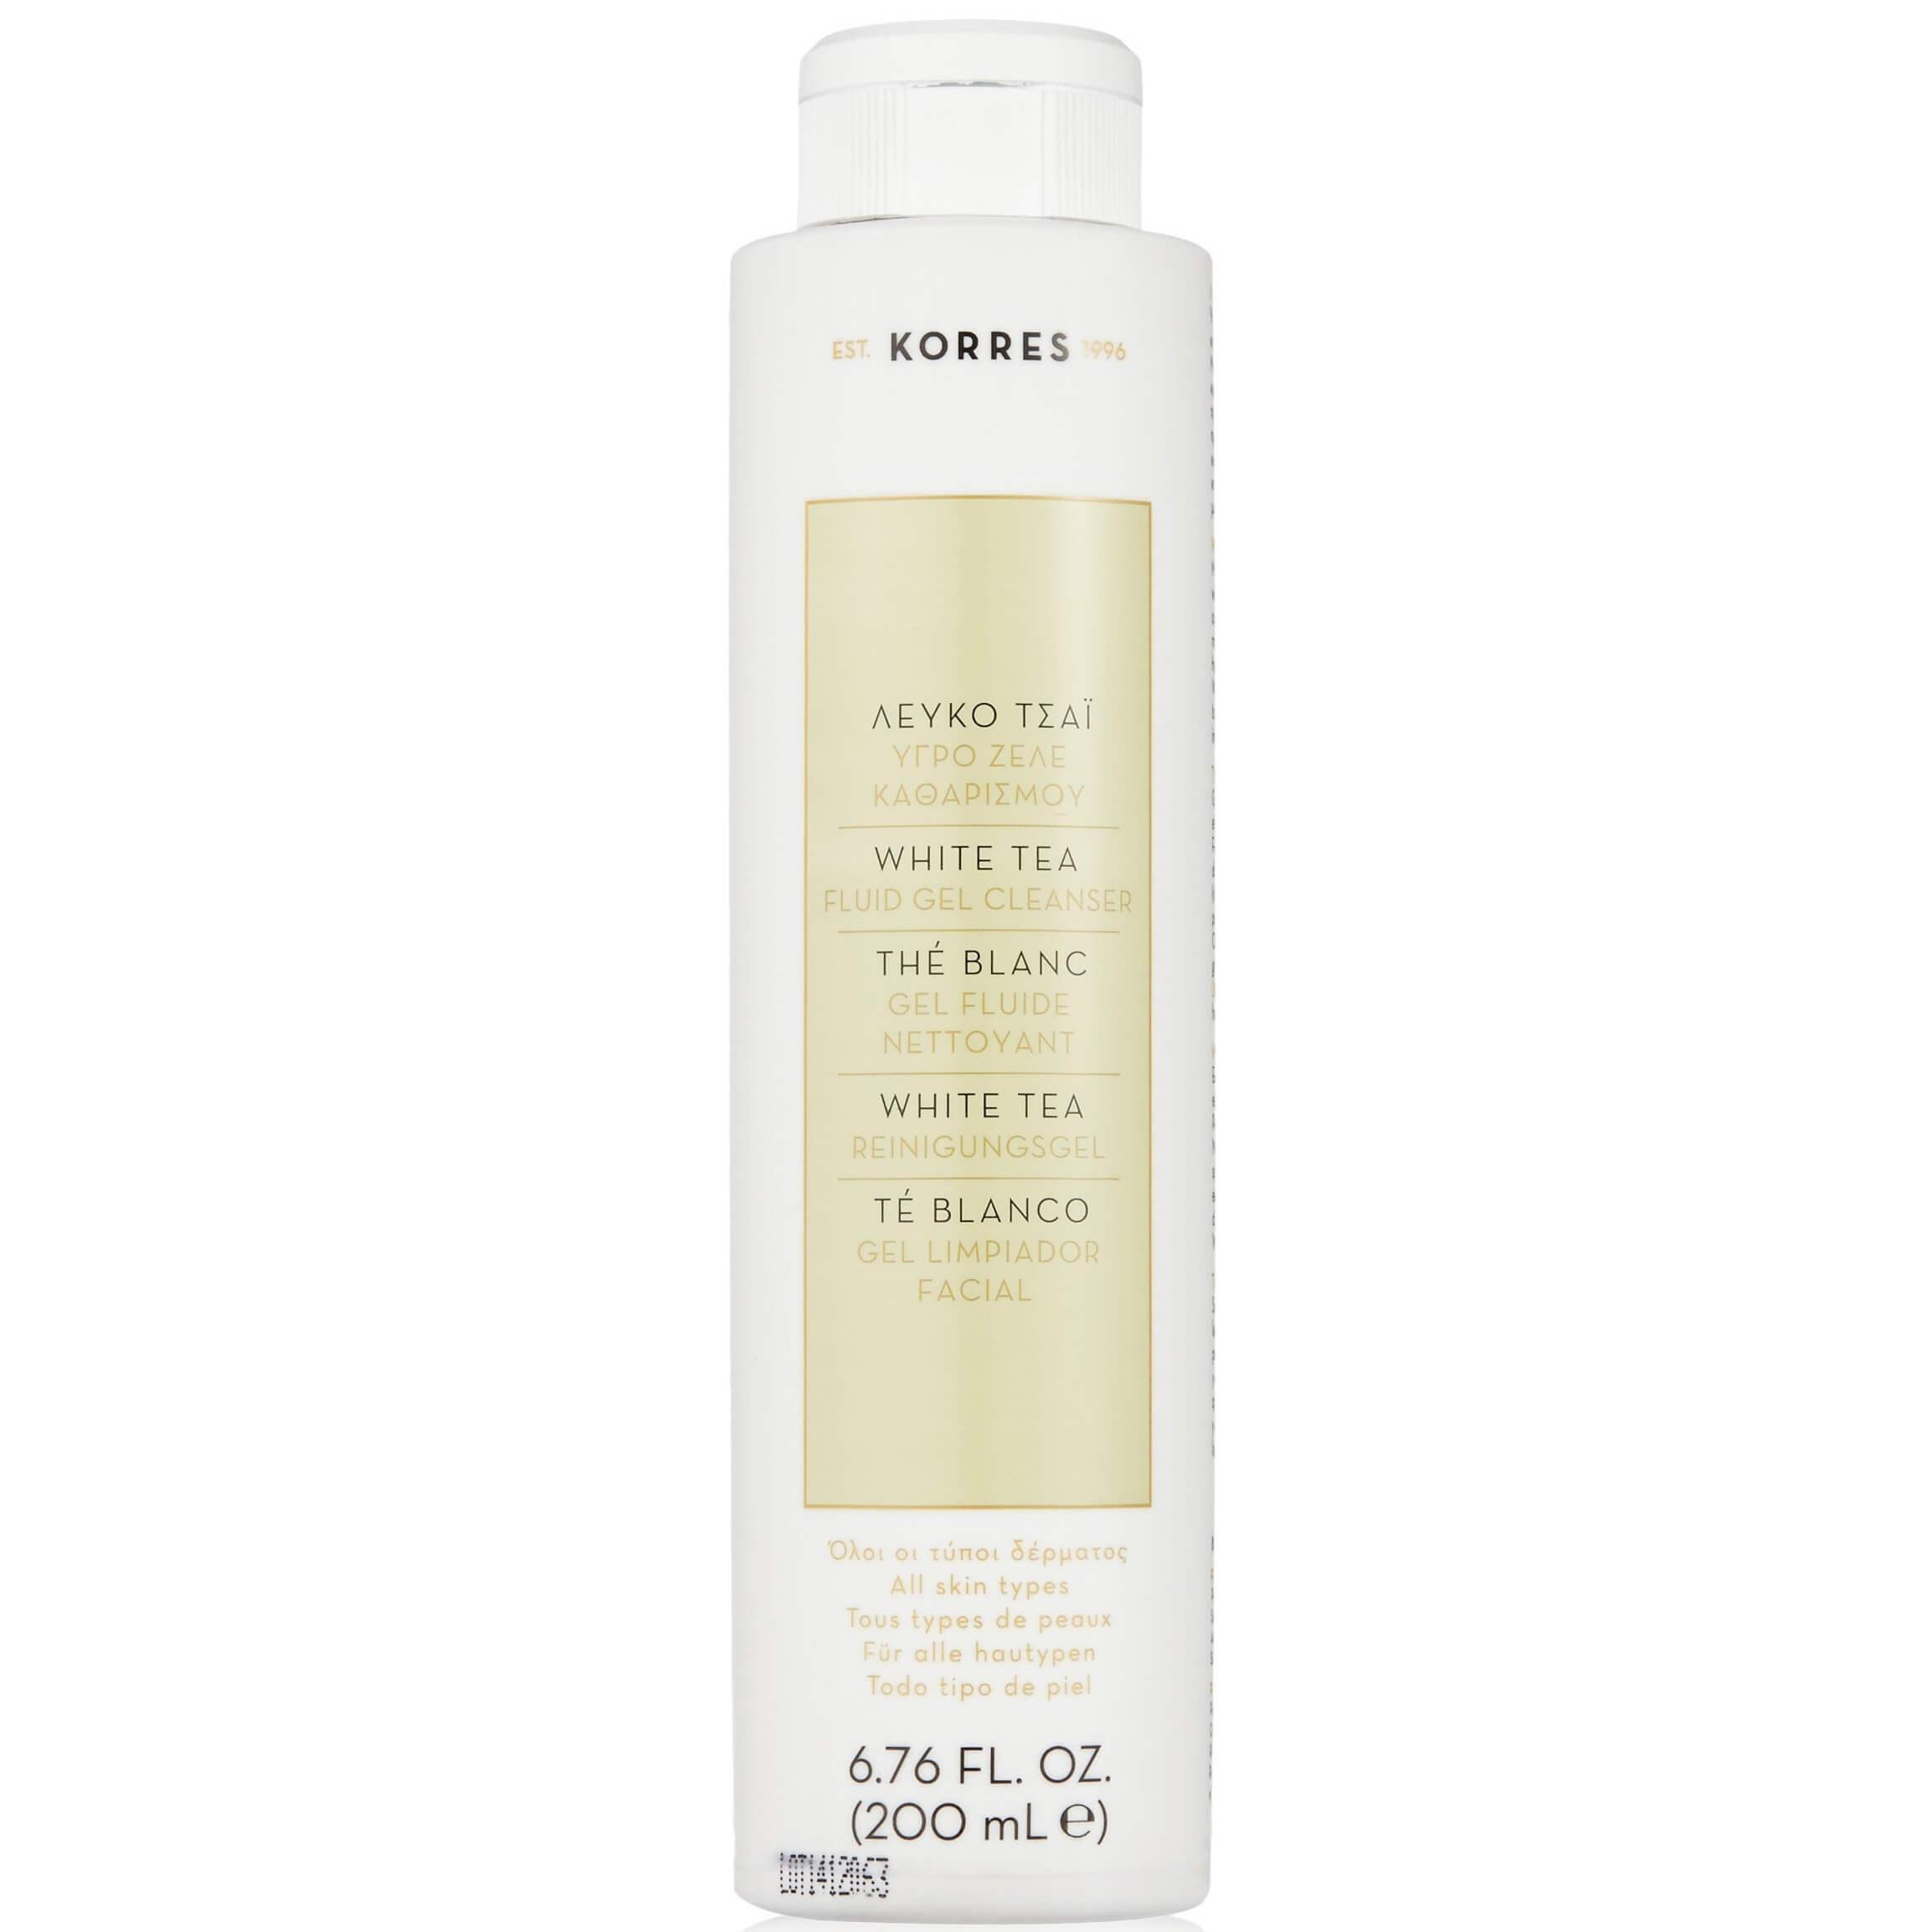 Korres Λευκό Τσάι Υγρό Gel Καθαρισμού για Όλους τους Τύπους Δέρματος 200ml ομορφιά   καθαρισμός προσώπου   υγρά   gel καθαρισμού